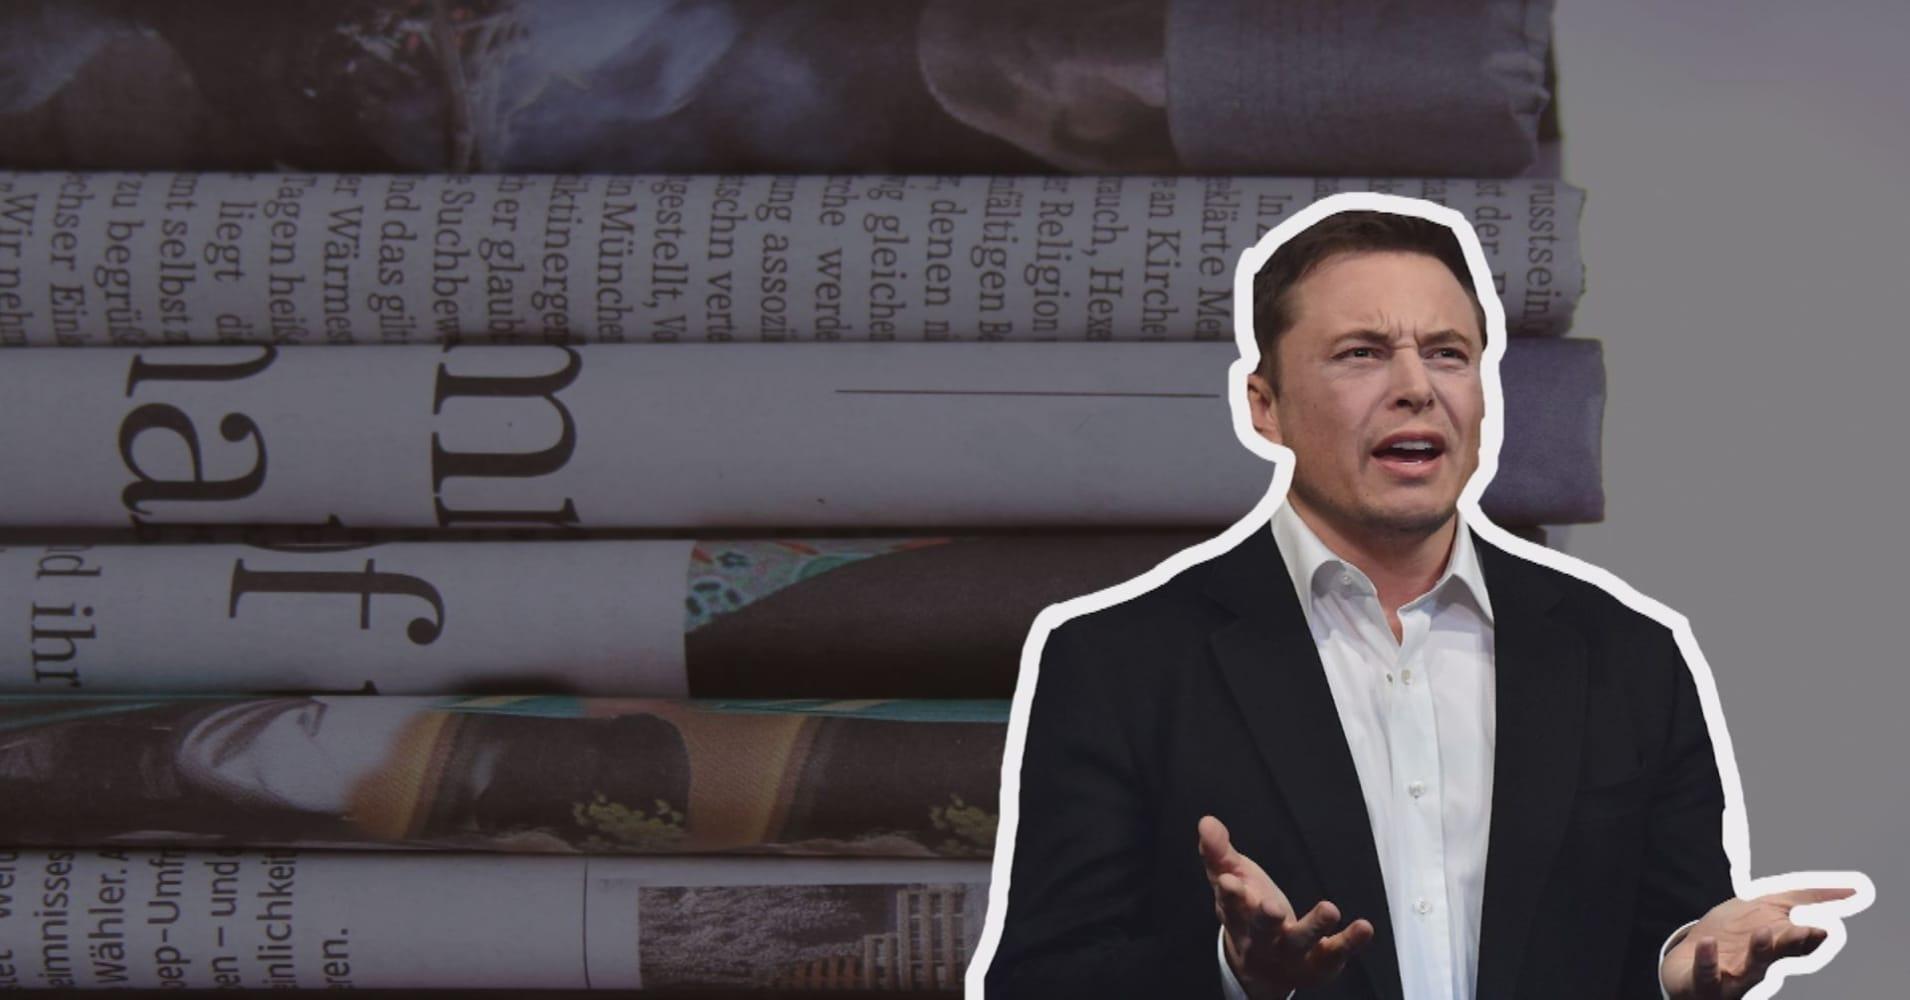 Elon Musk Versus the Media